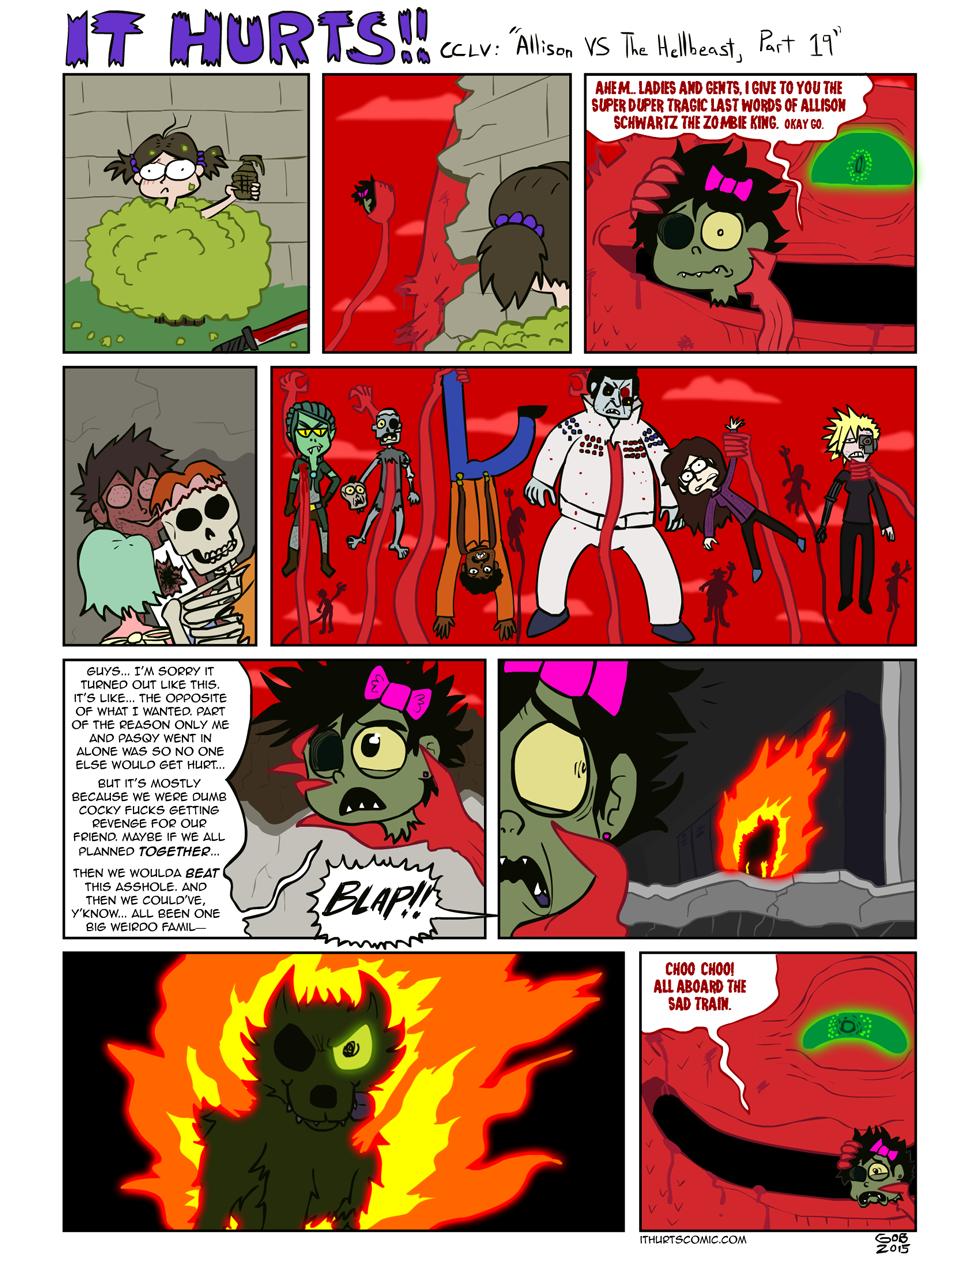 255: Allison VS The Hellbeast, Part 19